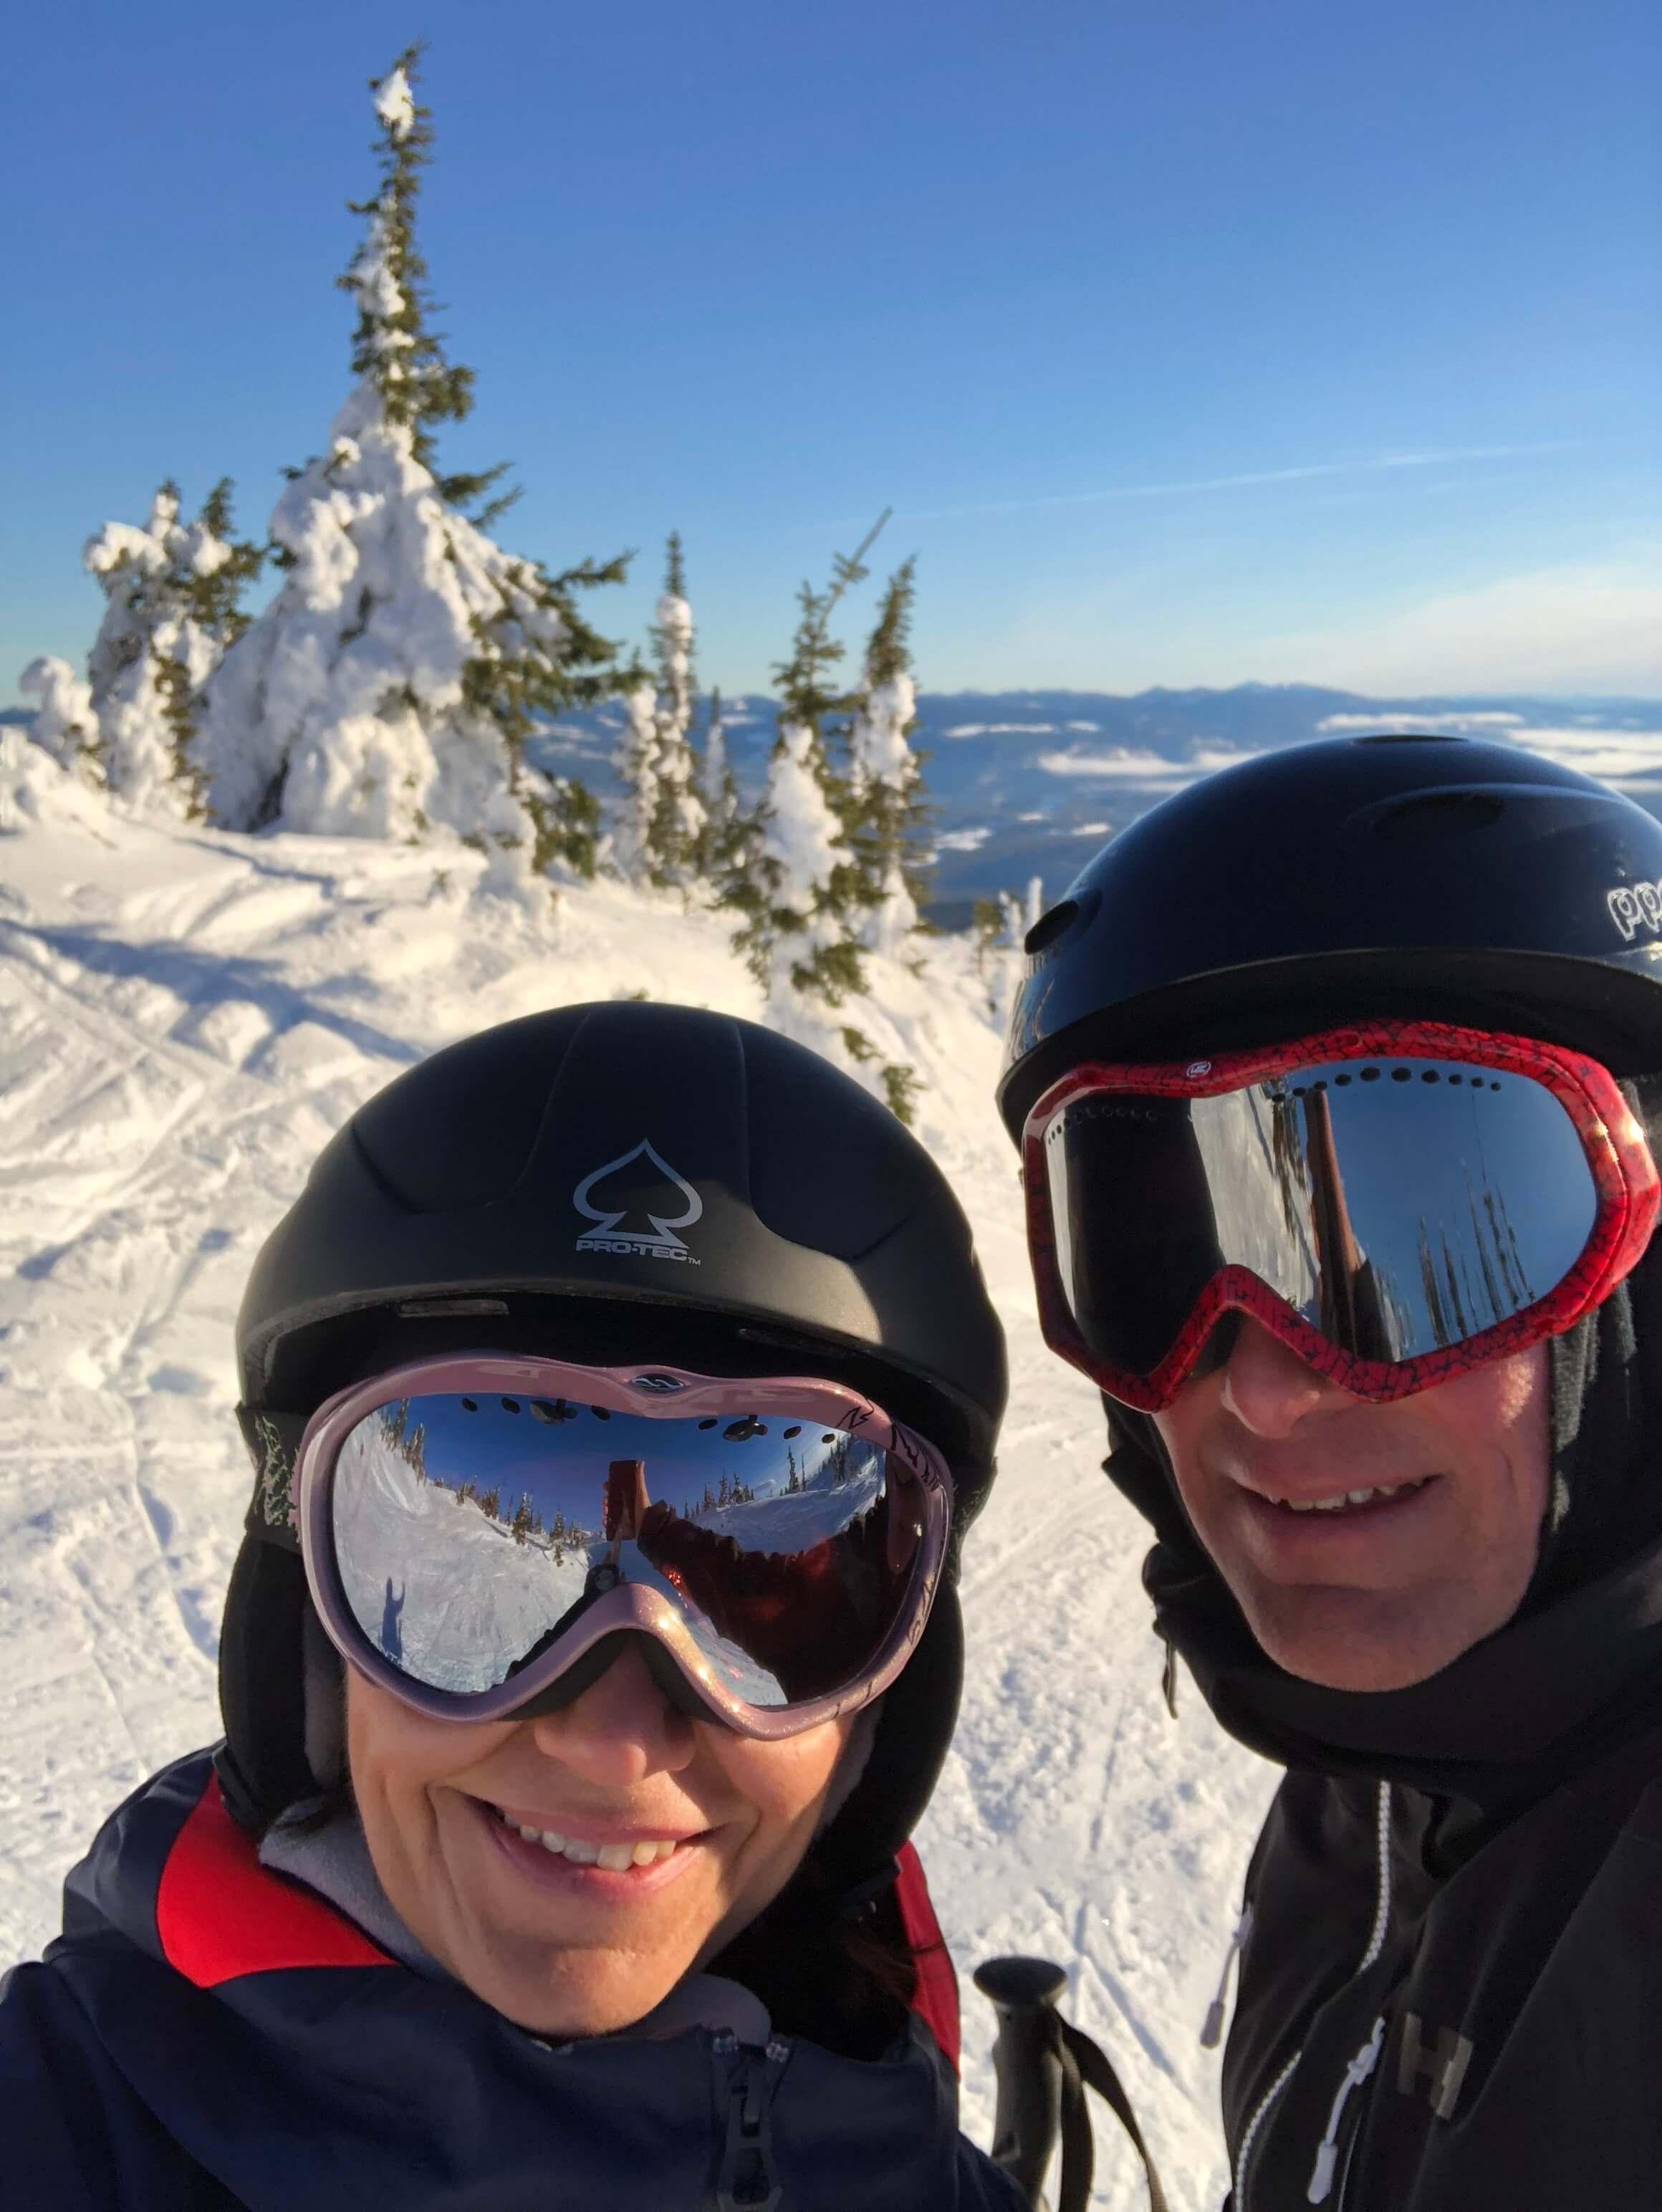 couple downhill skiing